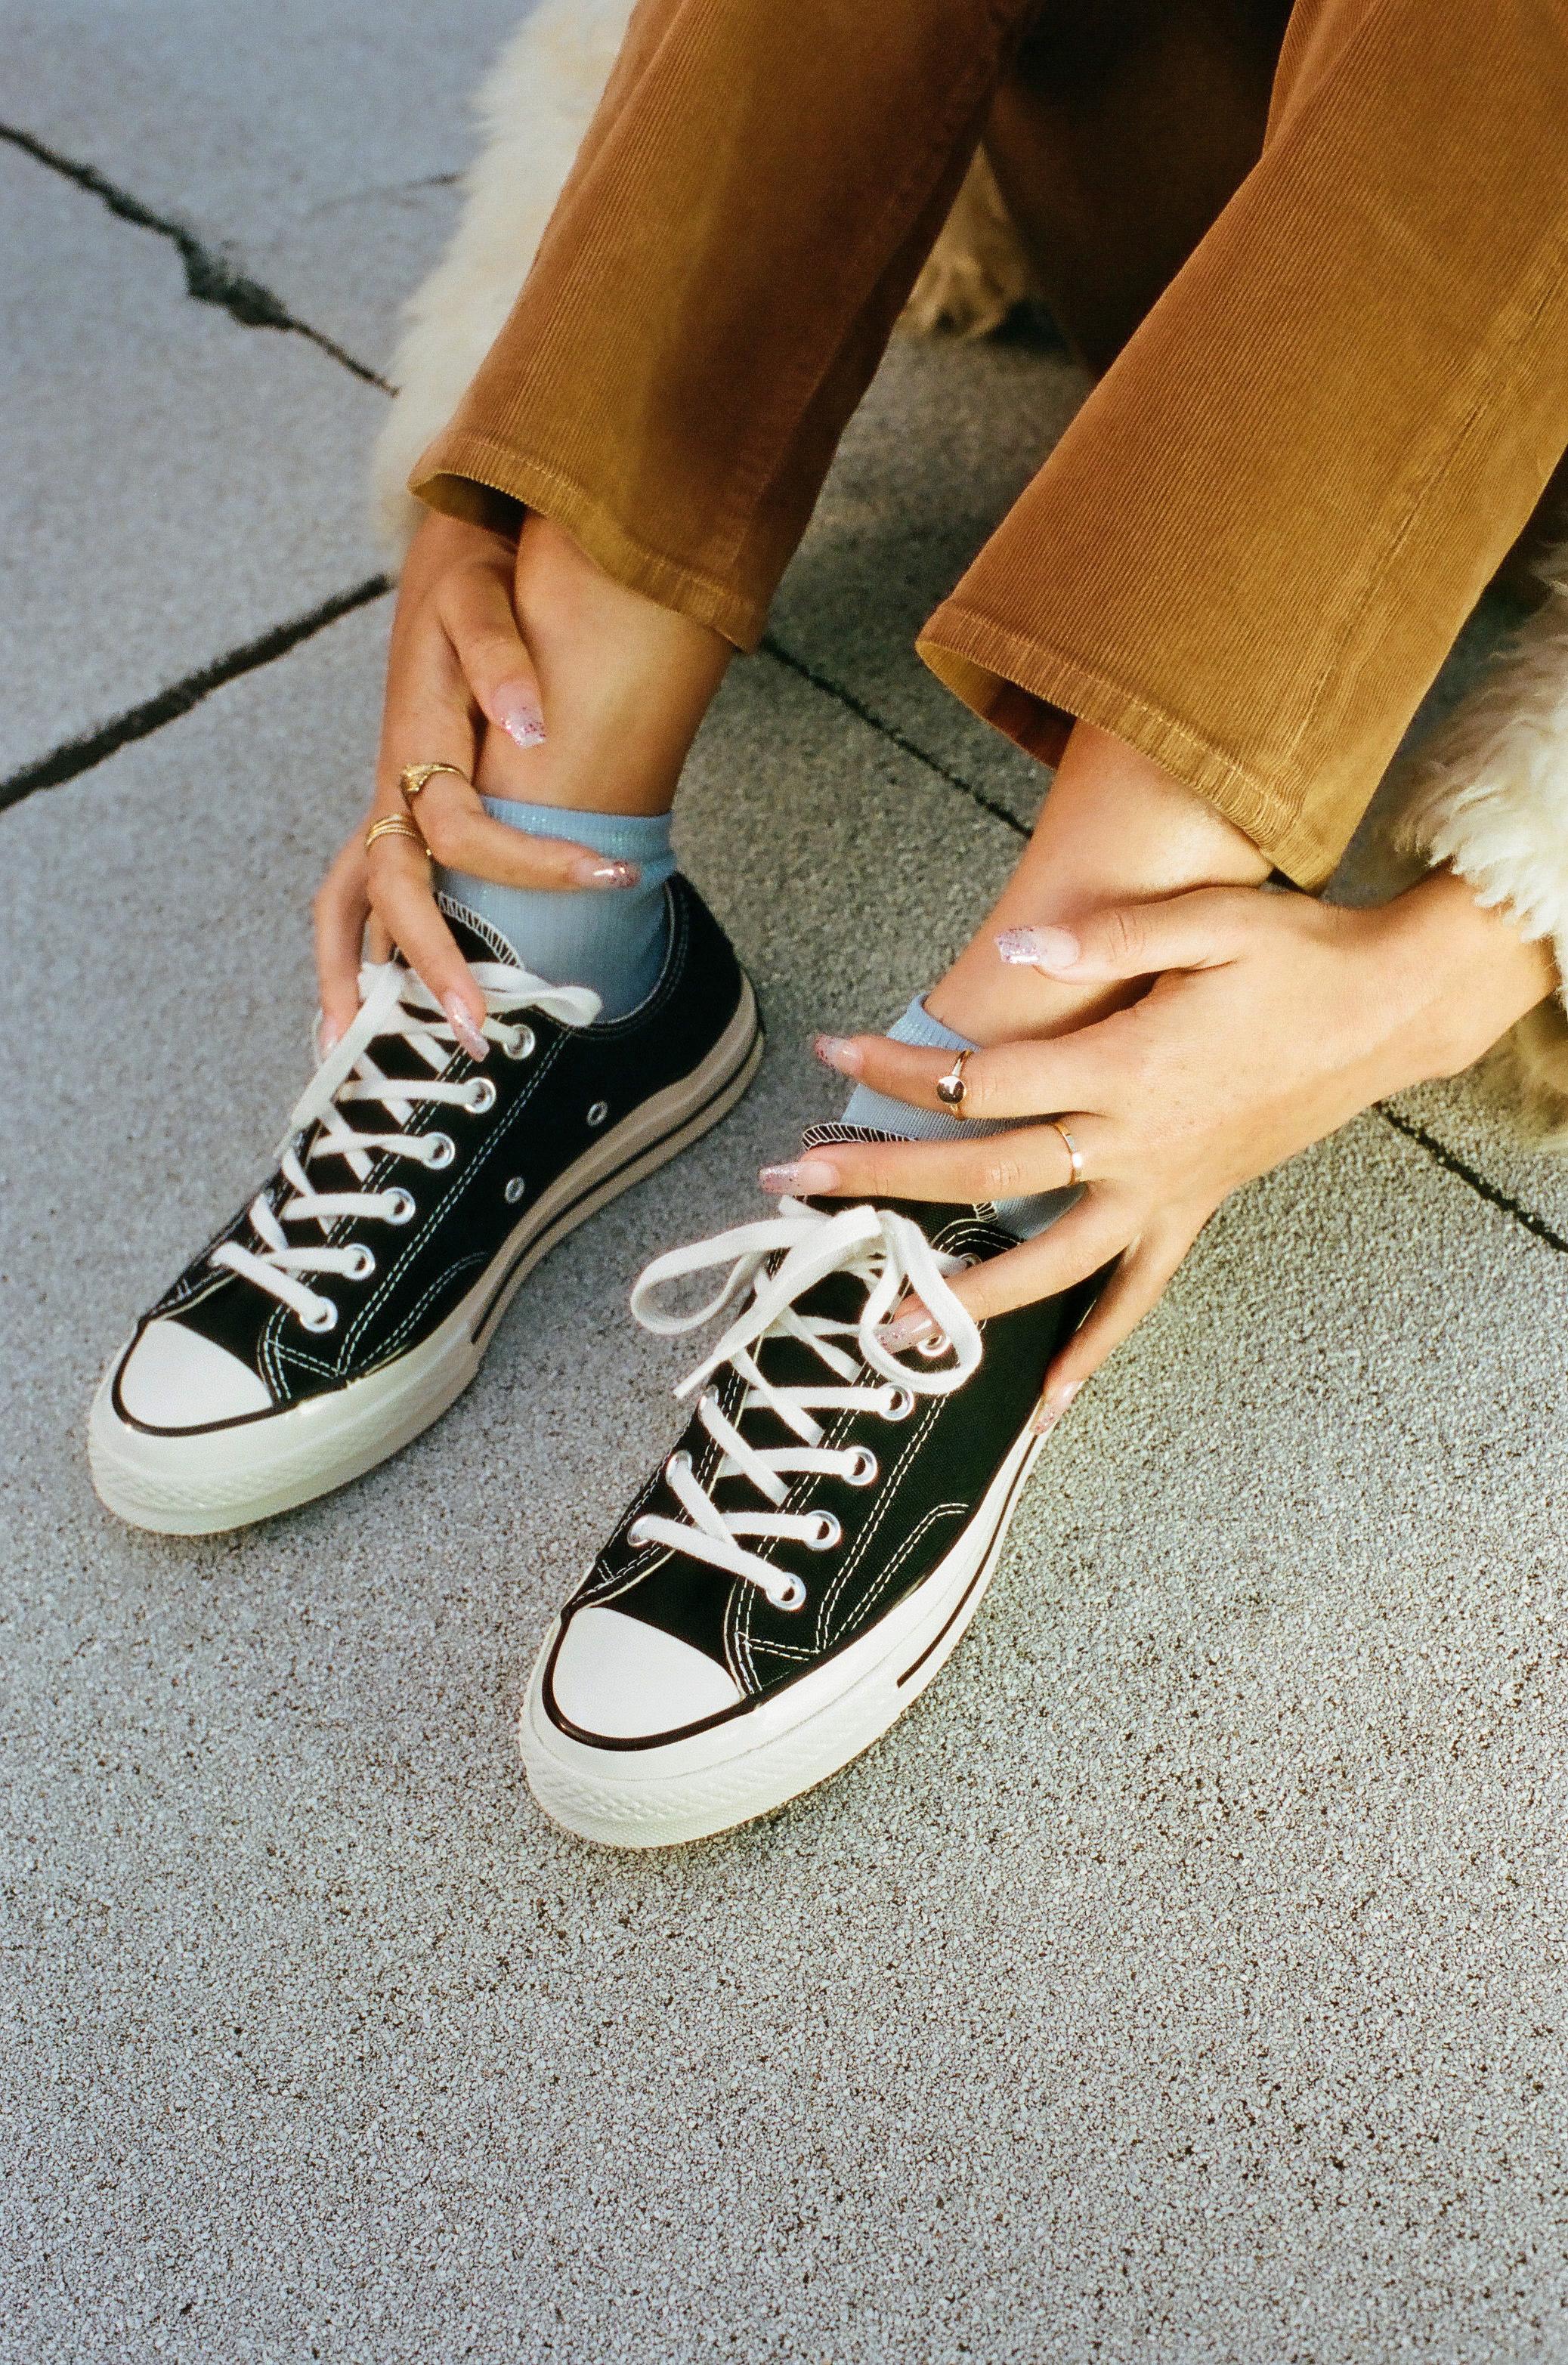 converse-forever-mayan-toledano-julia-baylis-los-angeles-70-s-folkr-09